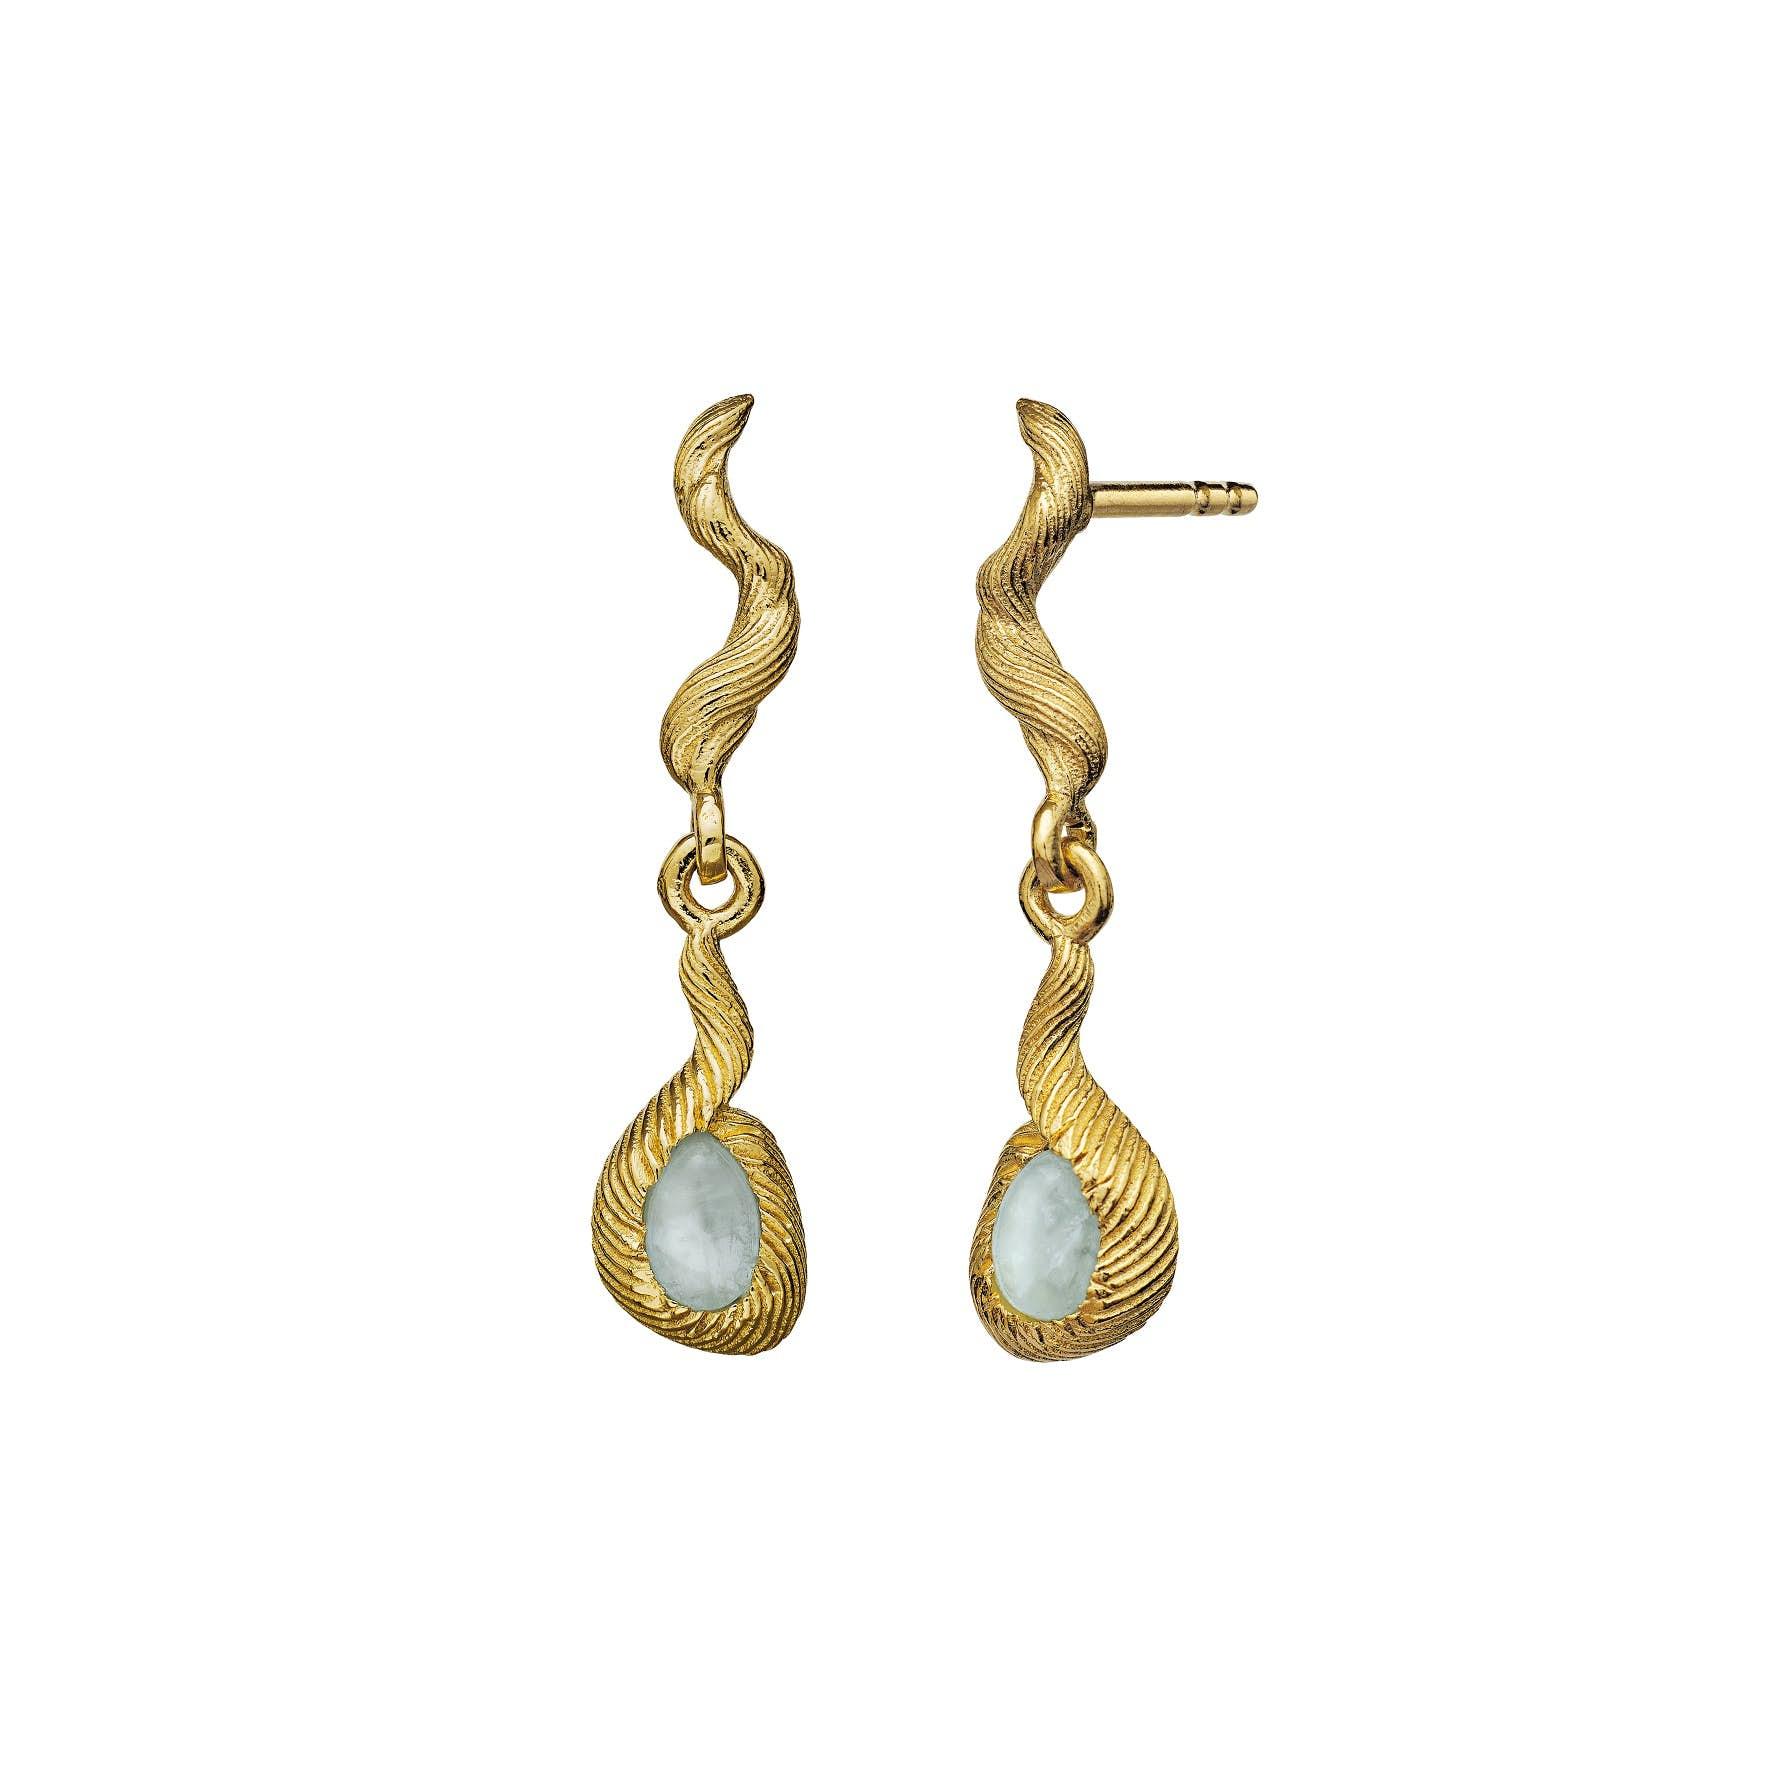 Nico Earrings von Maanesten in Vergoldet-Silber Sterling 925